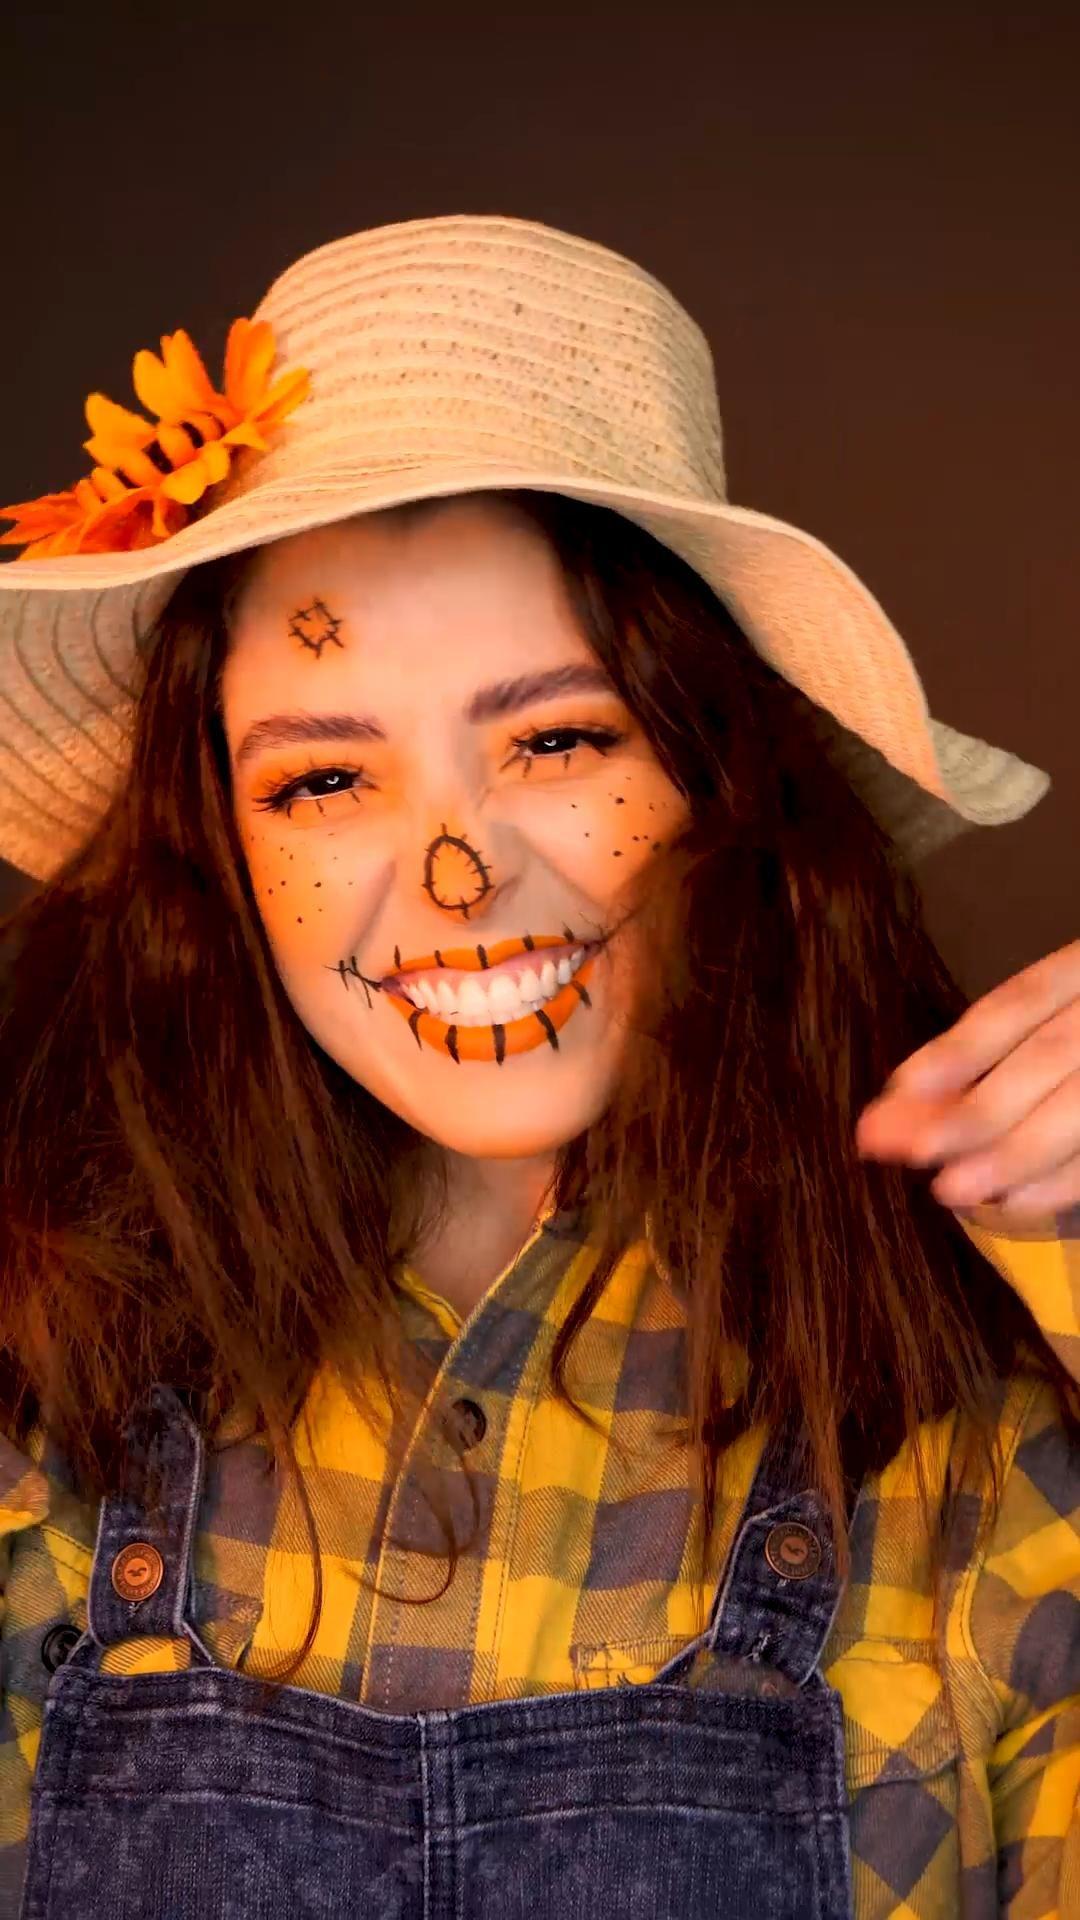 Maquillaje de espantapájaros SUPERFÁCIL